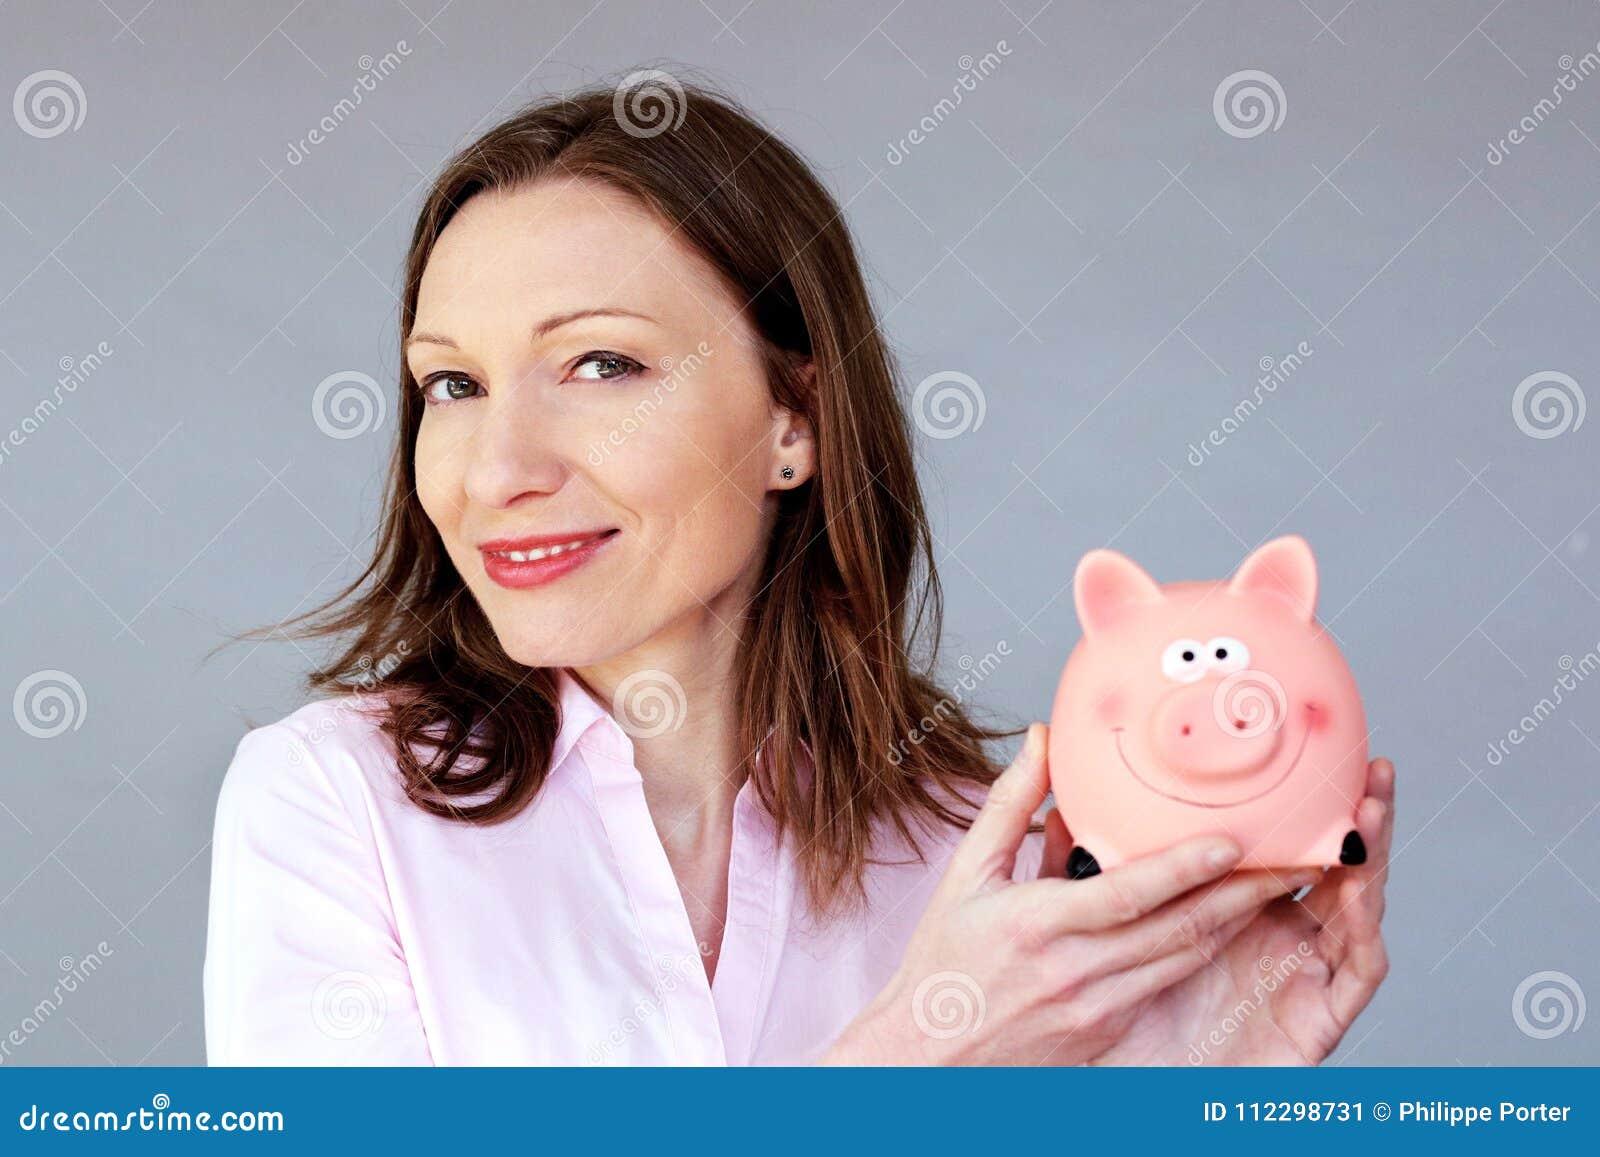 Money savings no stress woman holding moneybox piggy bank